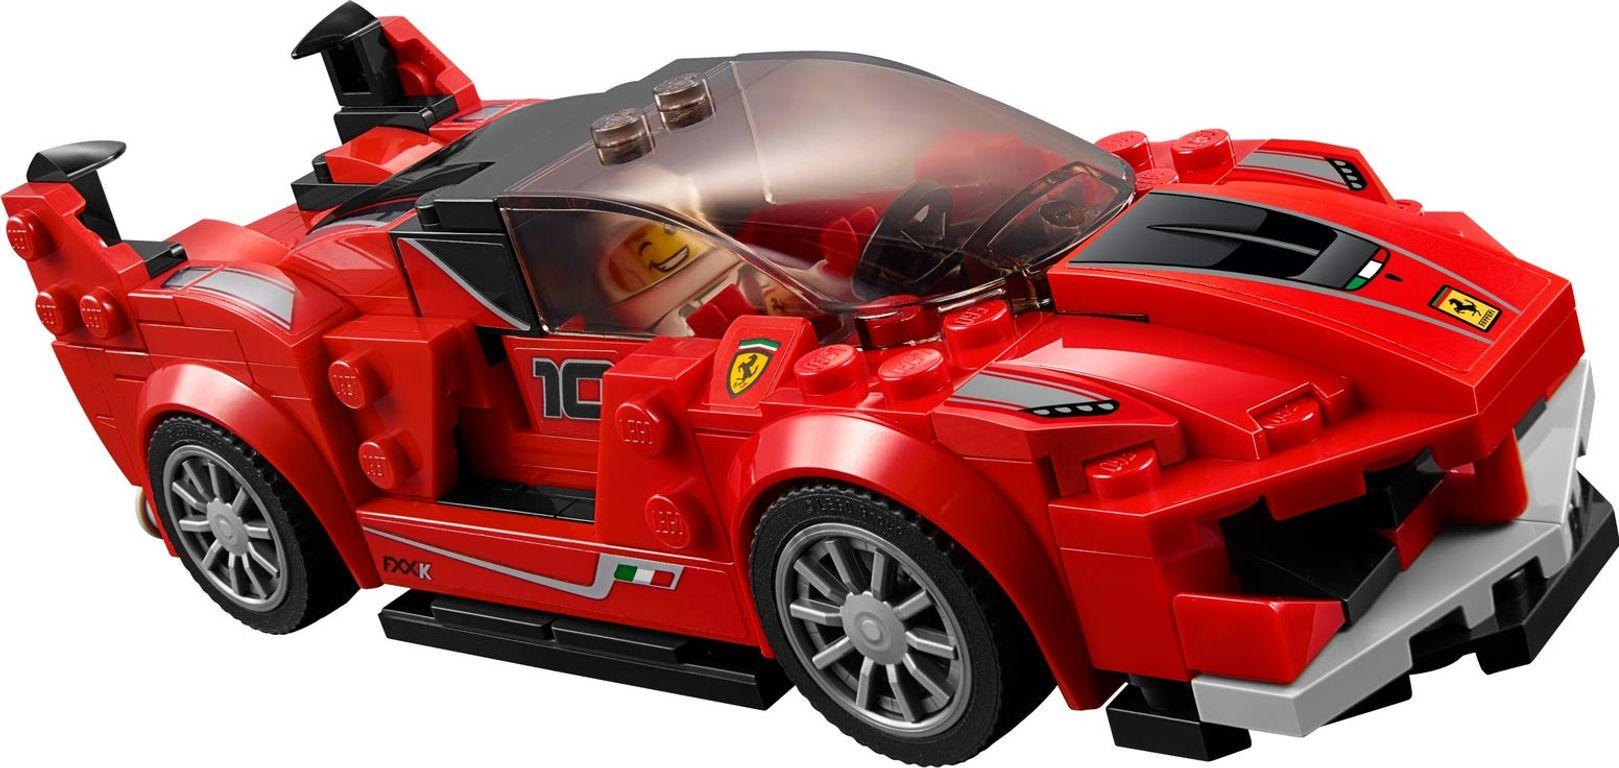 LEGO® Speed Champions Ferrari FXX K & Development Center components